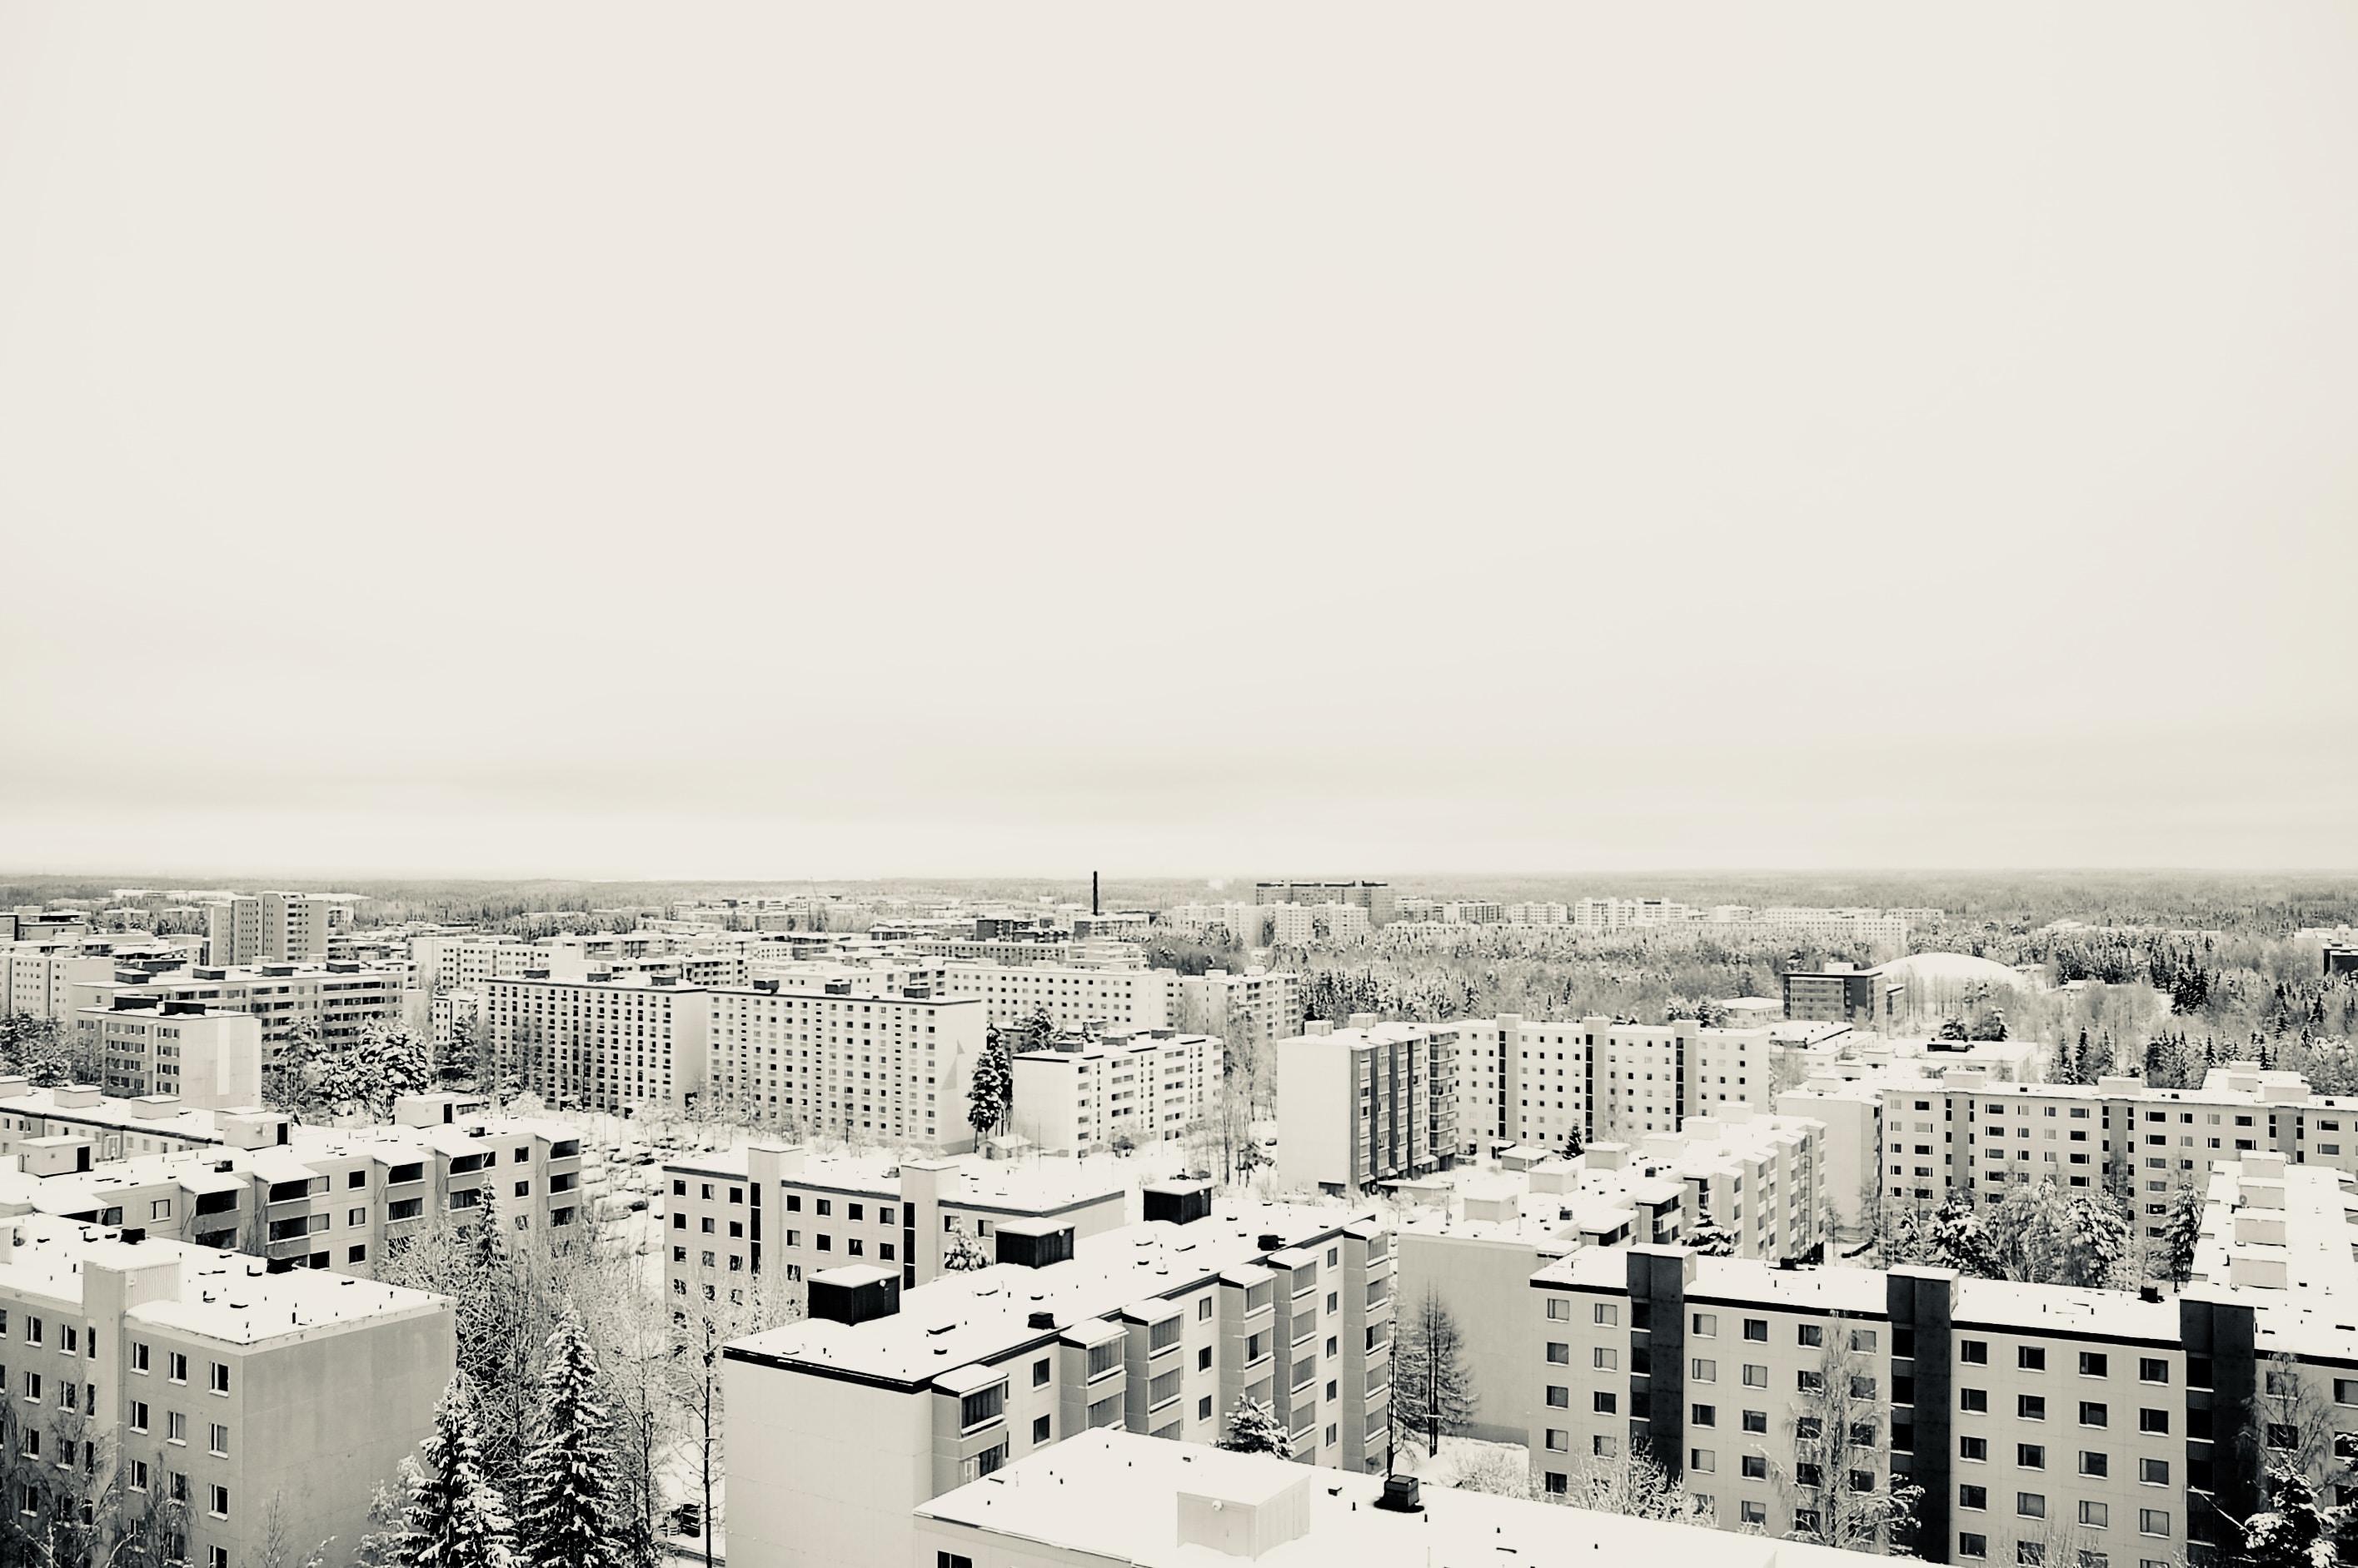 high angle photo of cityscape